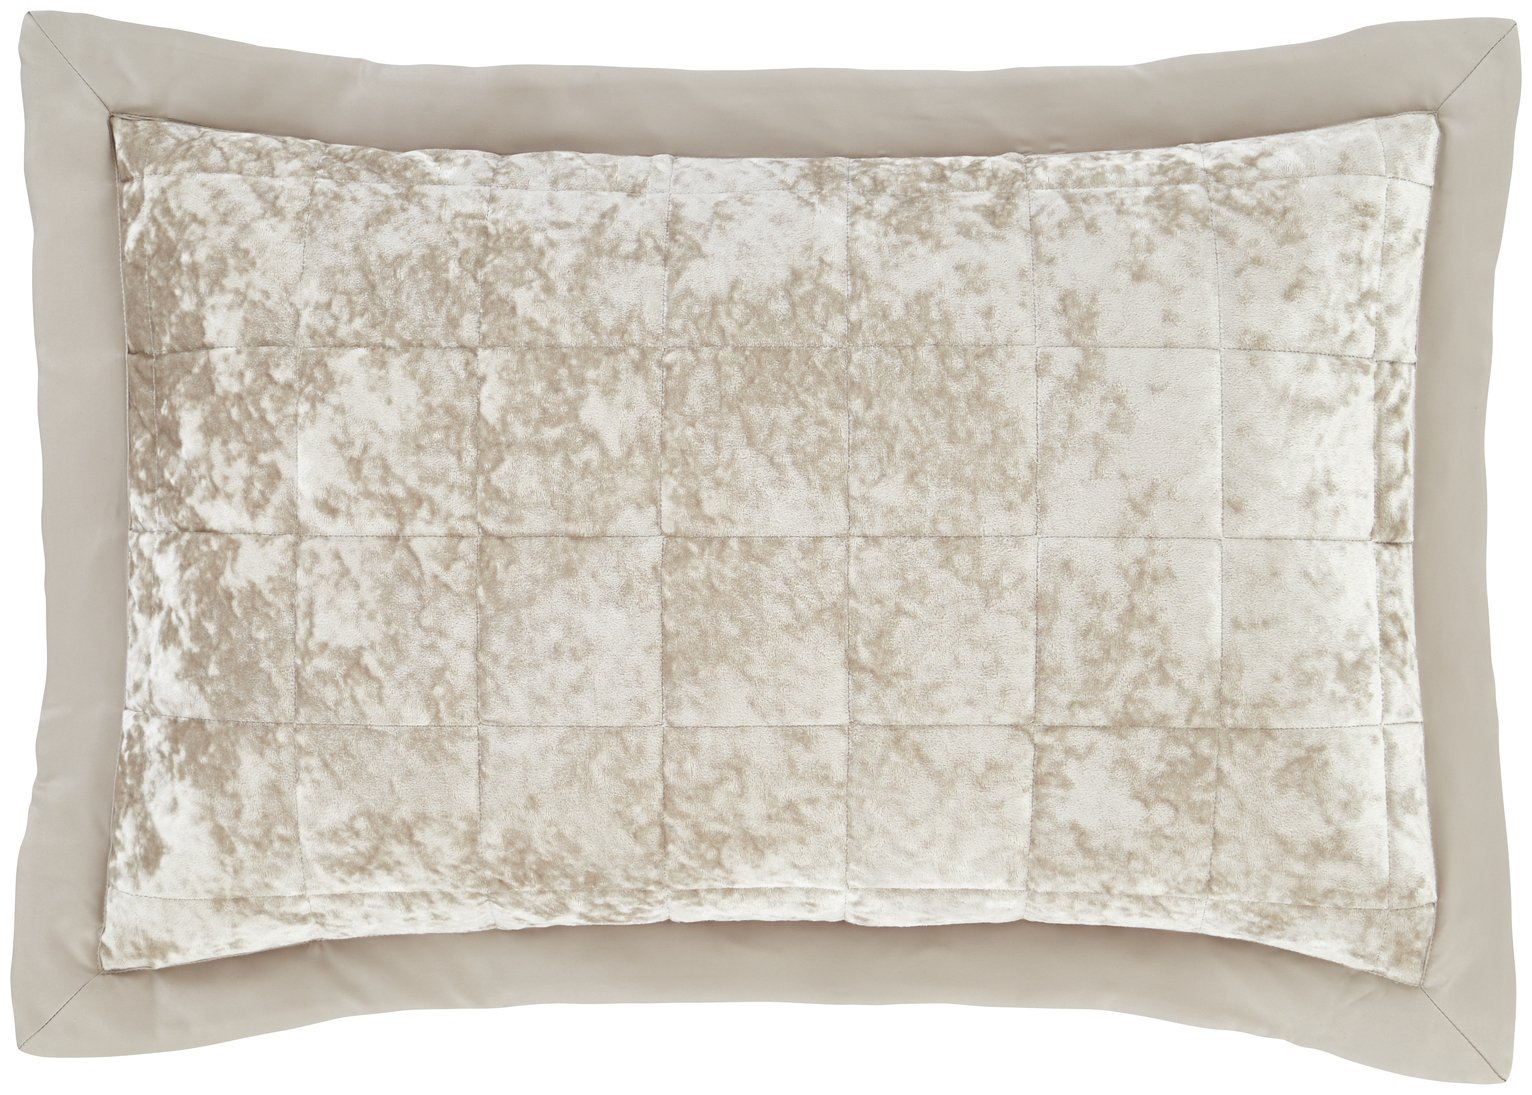 Catherine Lansfield Crushed Velvet Pillow Cover Pair - Nat